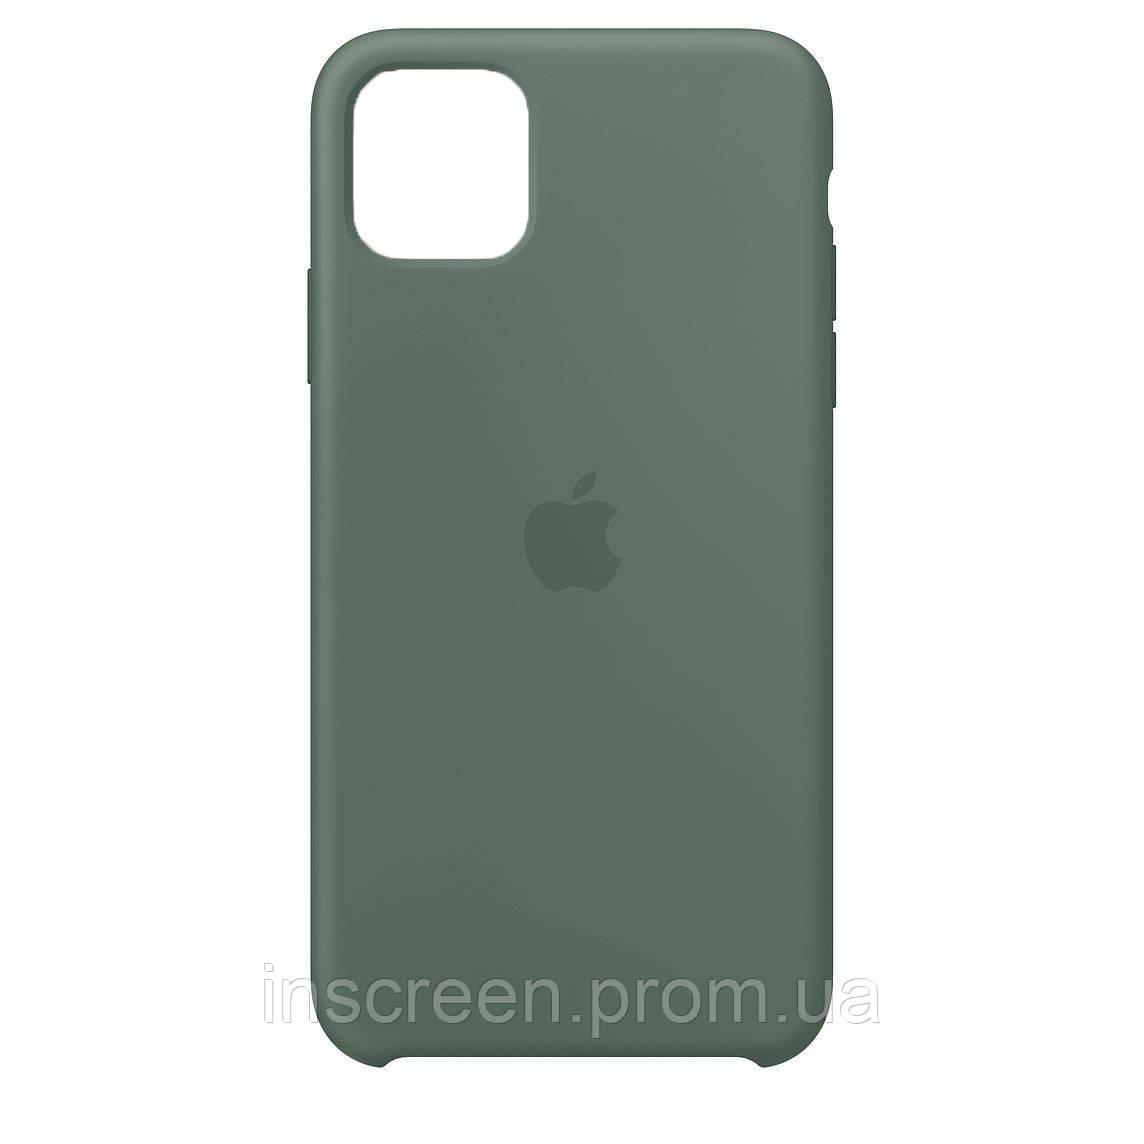 Чохол силіконовий Silicone Case для Apple iPhone 12 Mini Pine Green